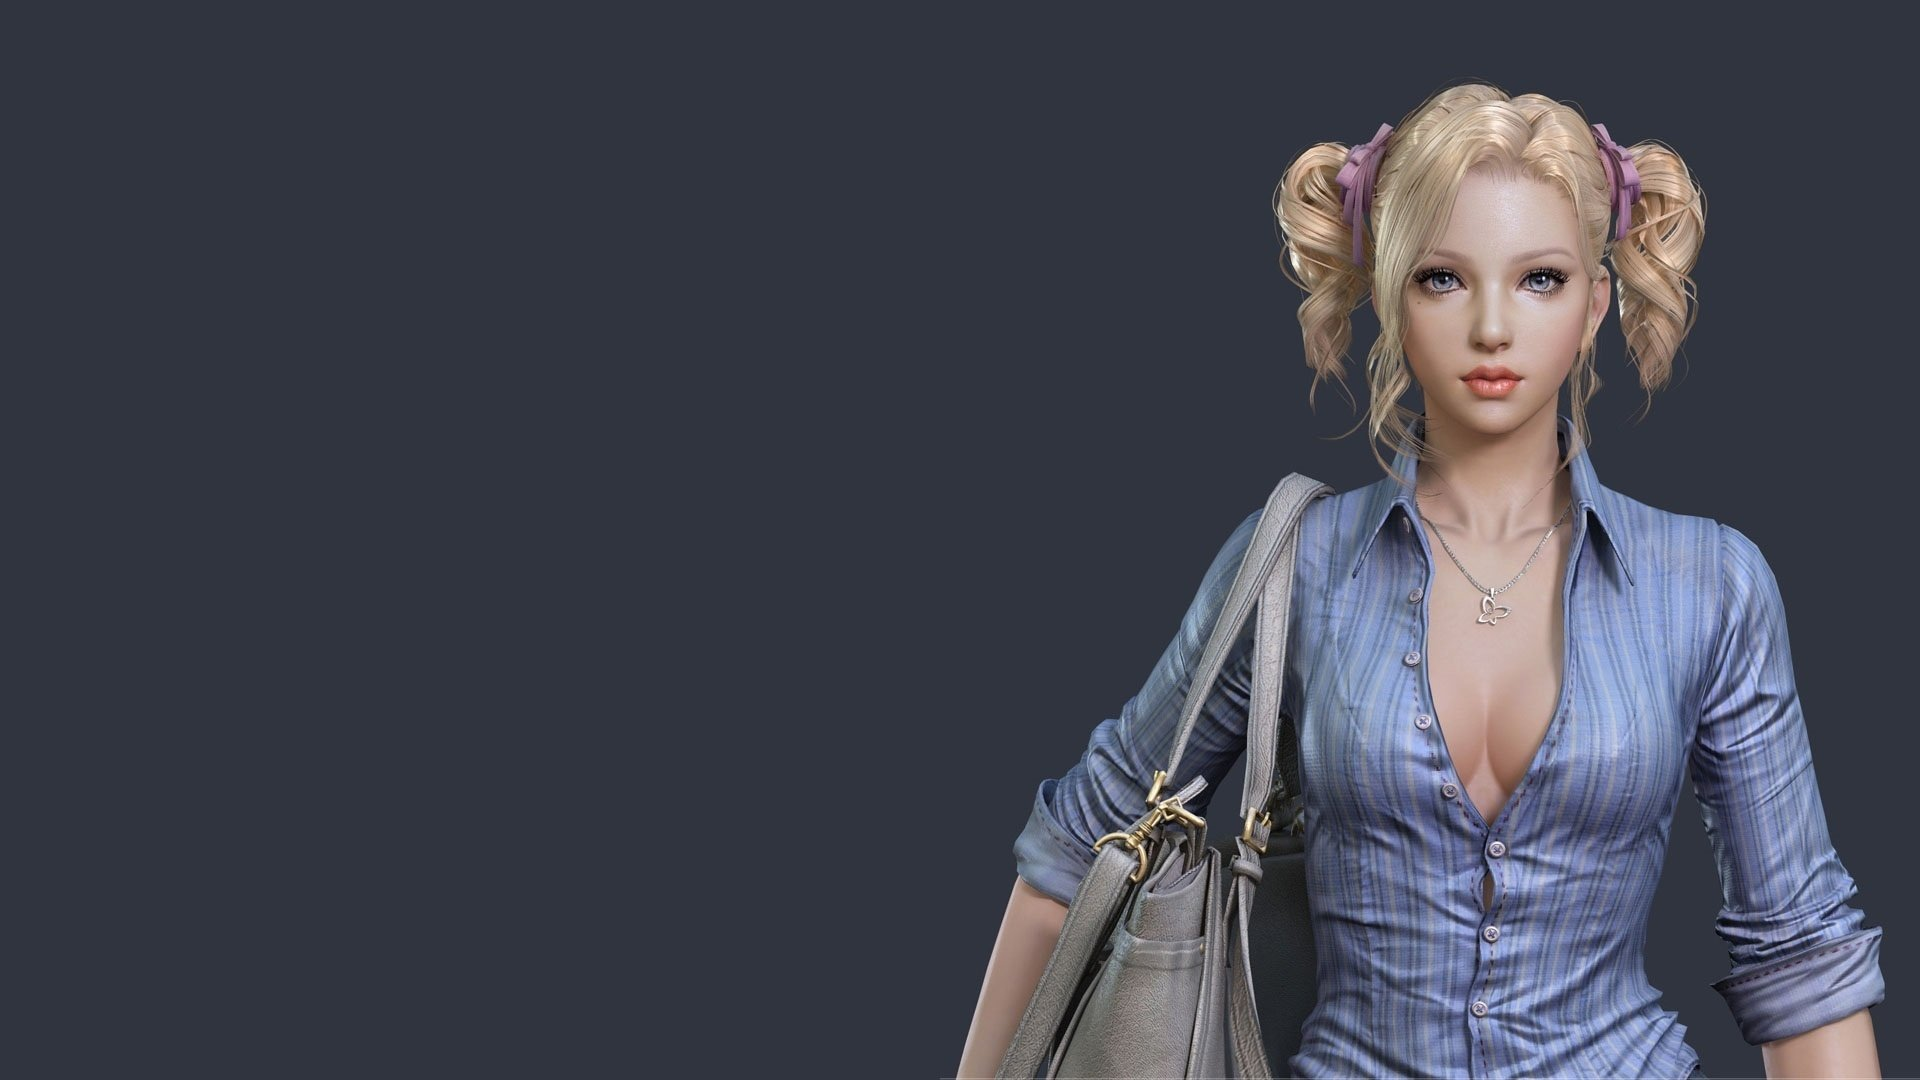 Artistic - Women  Woman Girl Blonde Blue Eyes Twintails Wallpaper